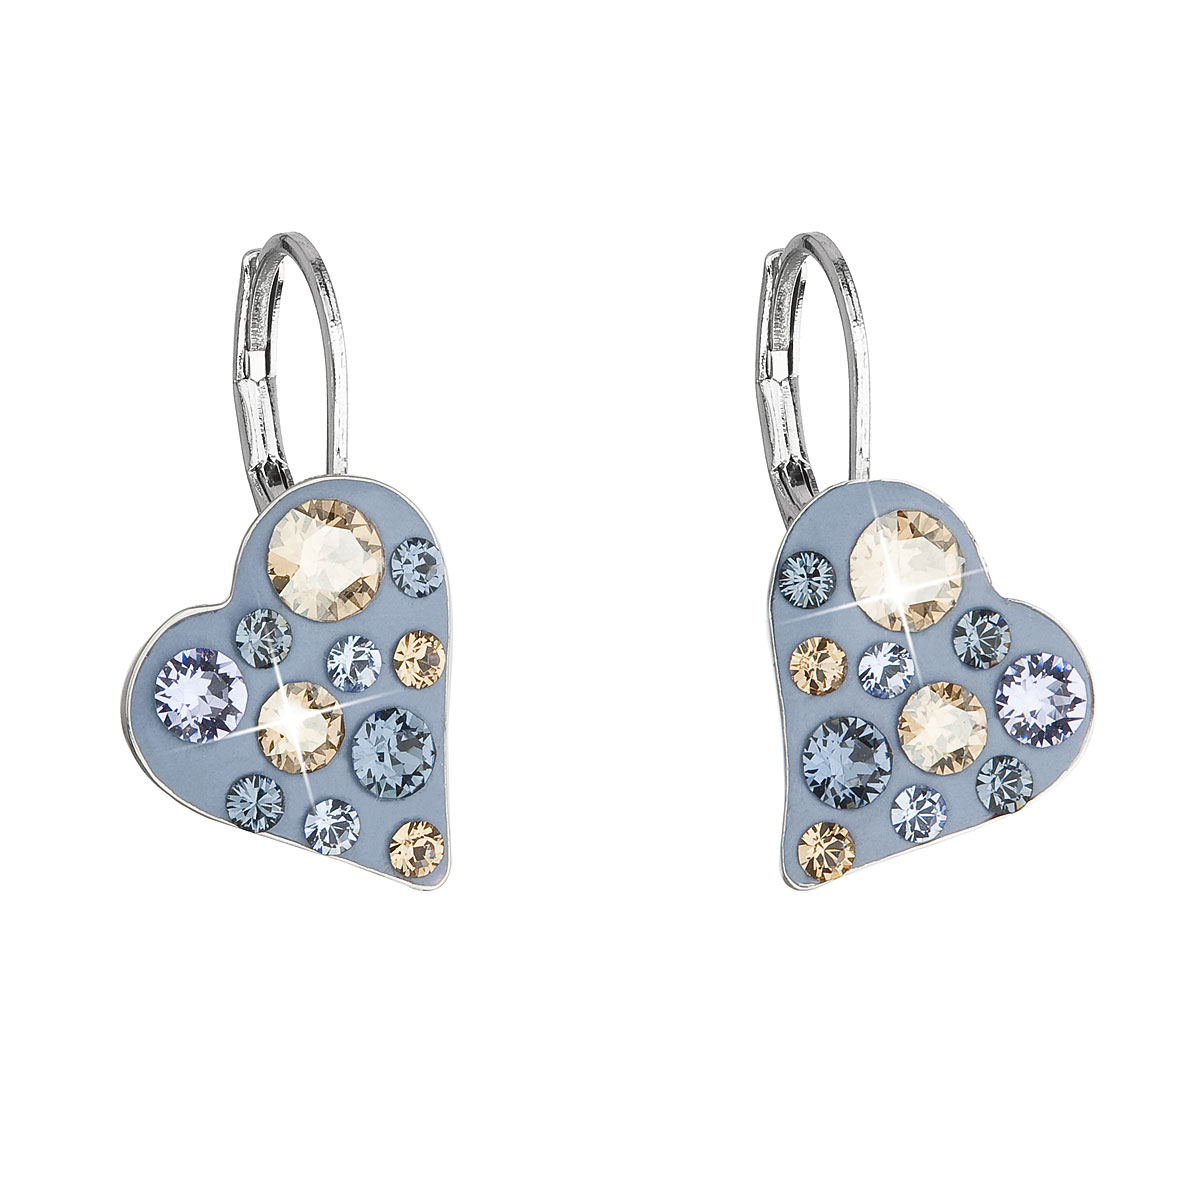 Náušnice bižutéria so Swarovski krištáľmi modré srdce 51043.3 denim